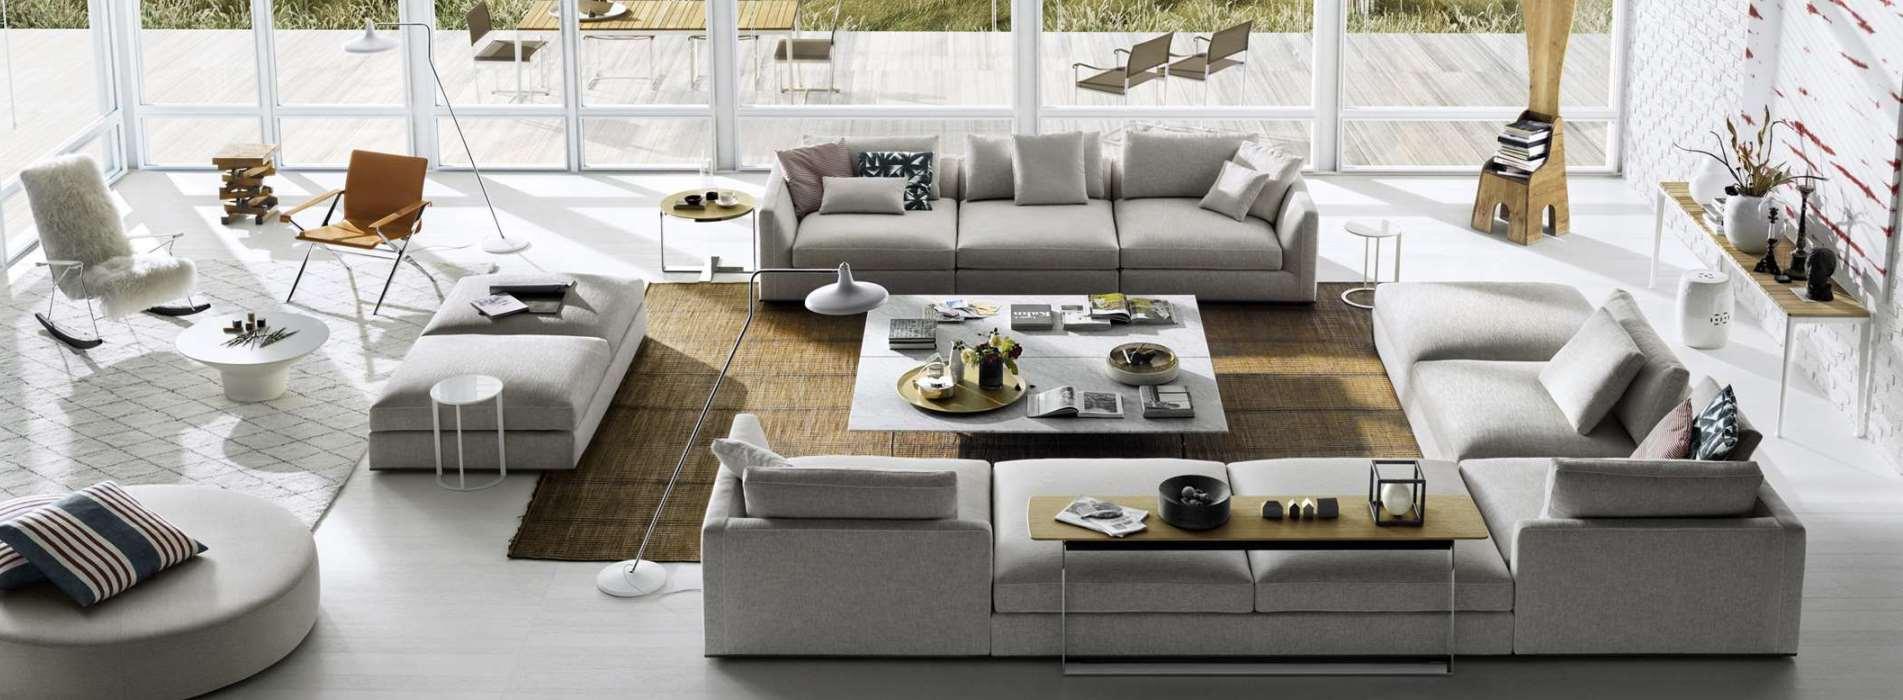 Inside-Concept-Architecture-d-interieur-mobilier-design-Testata-Richard-banner